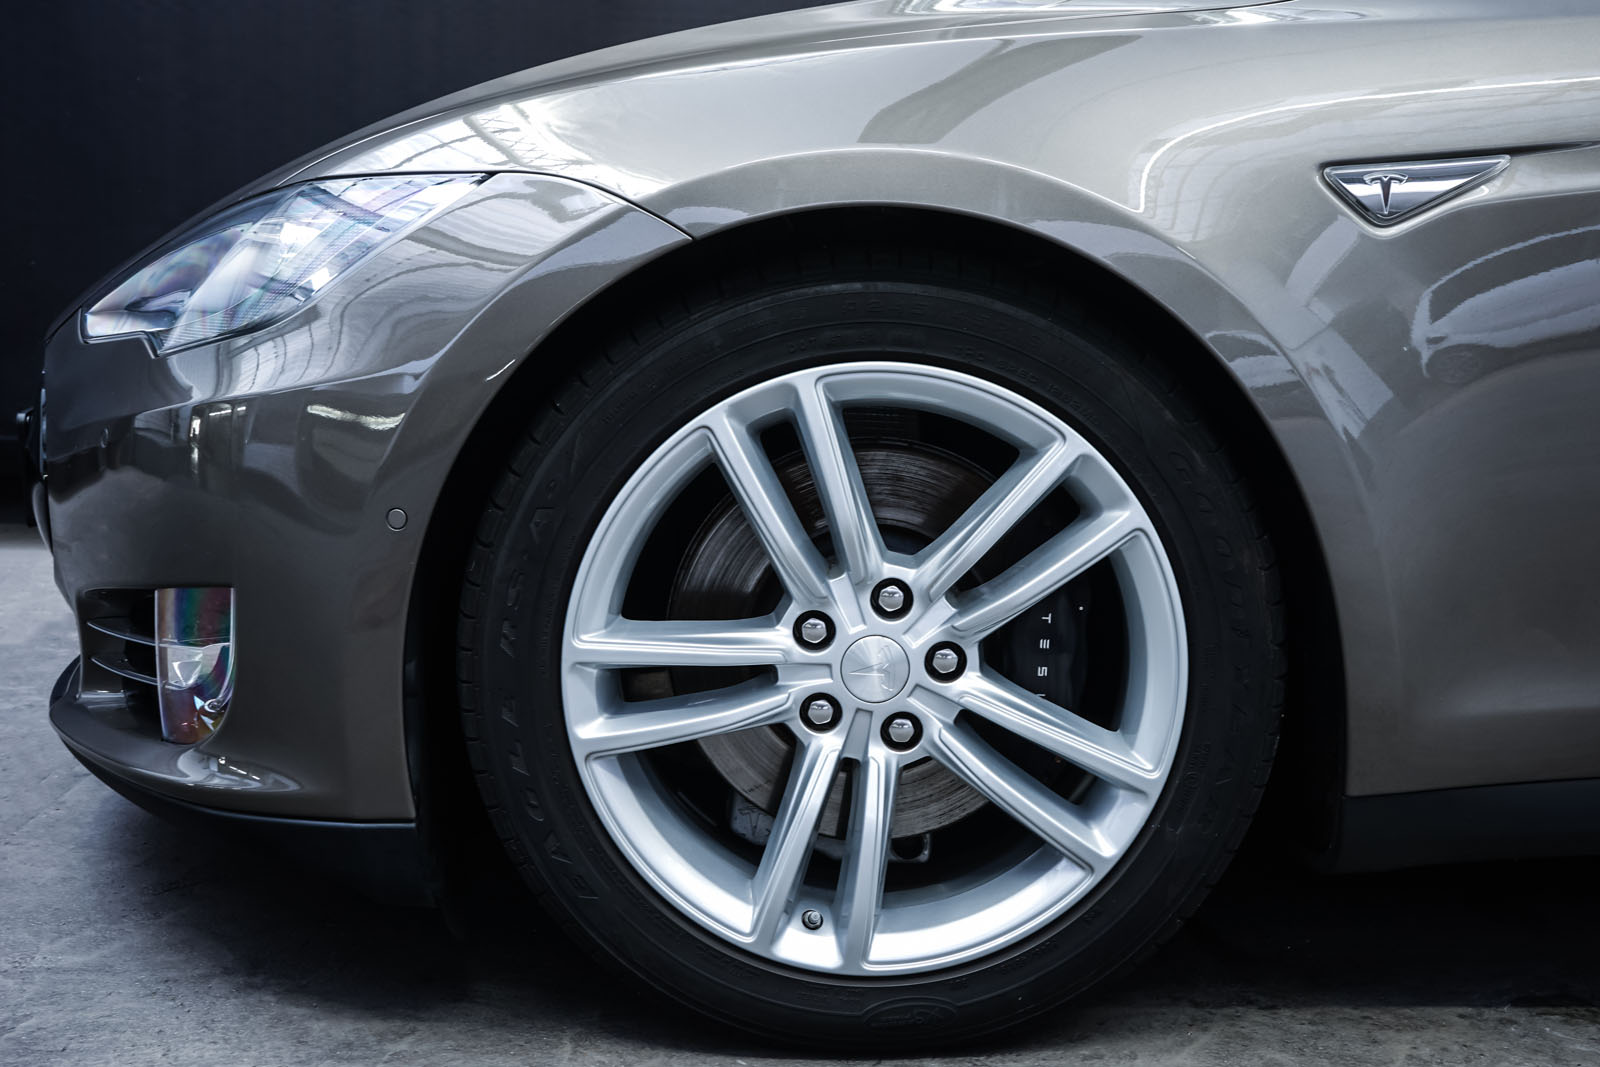 Tesla_ModelS85D_TitaniumMetallic_Beige_Tes-2897_3_w